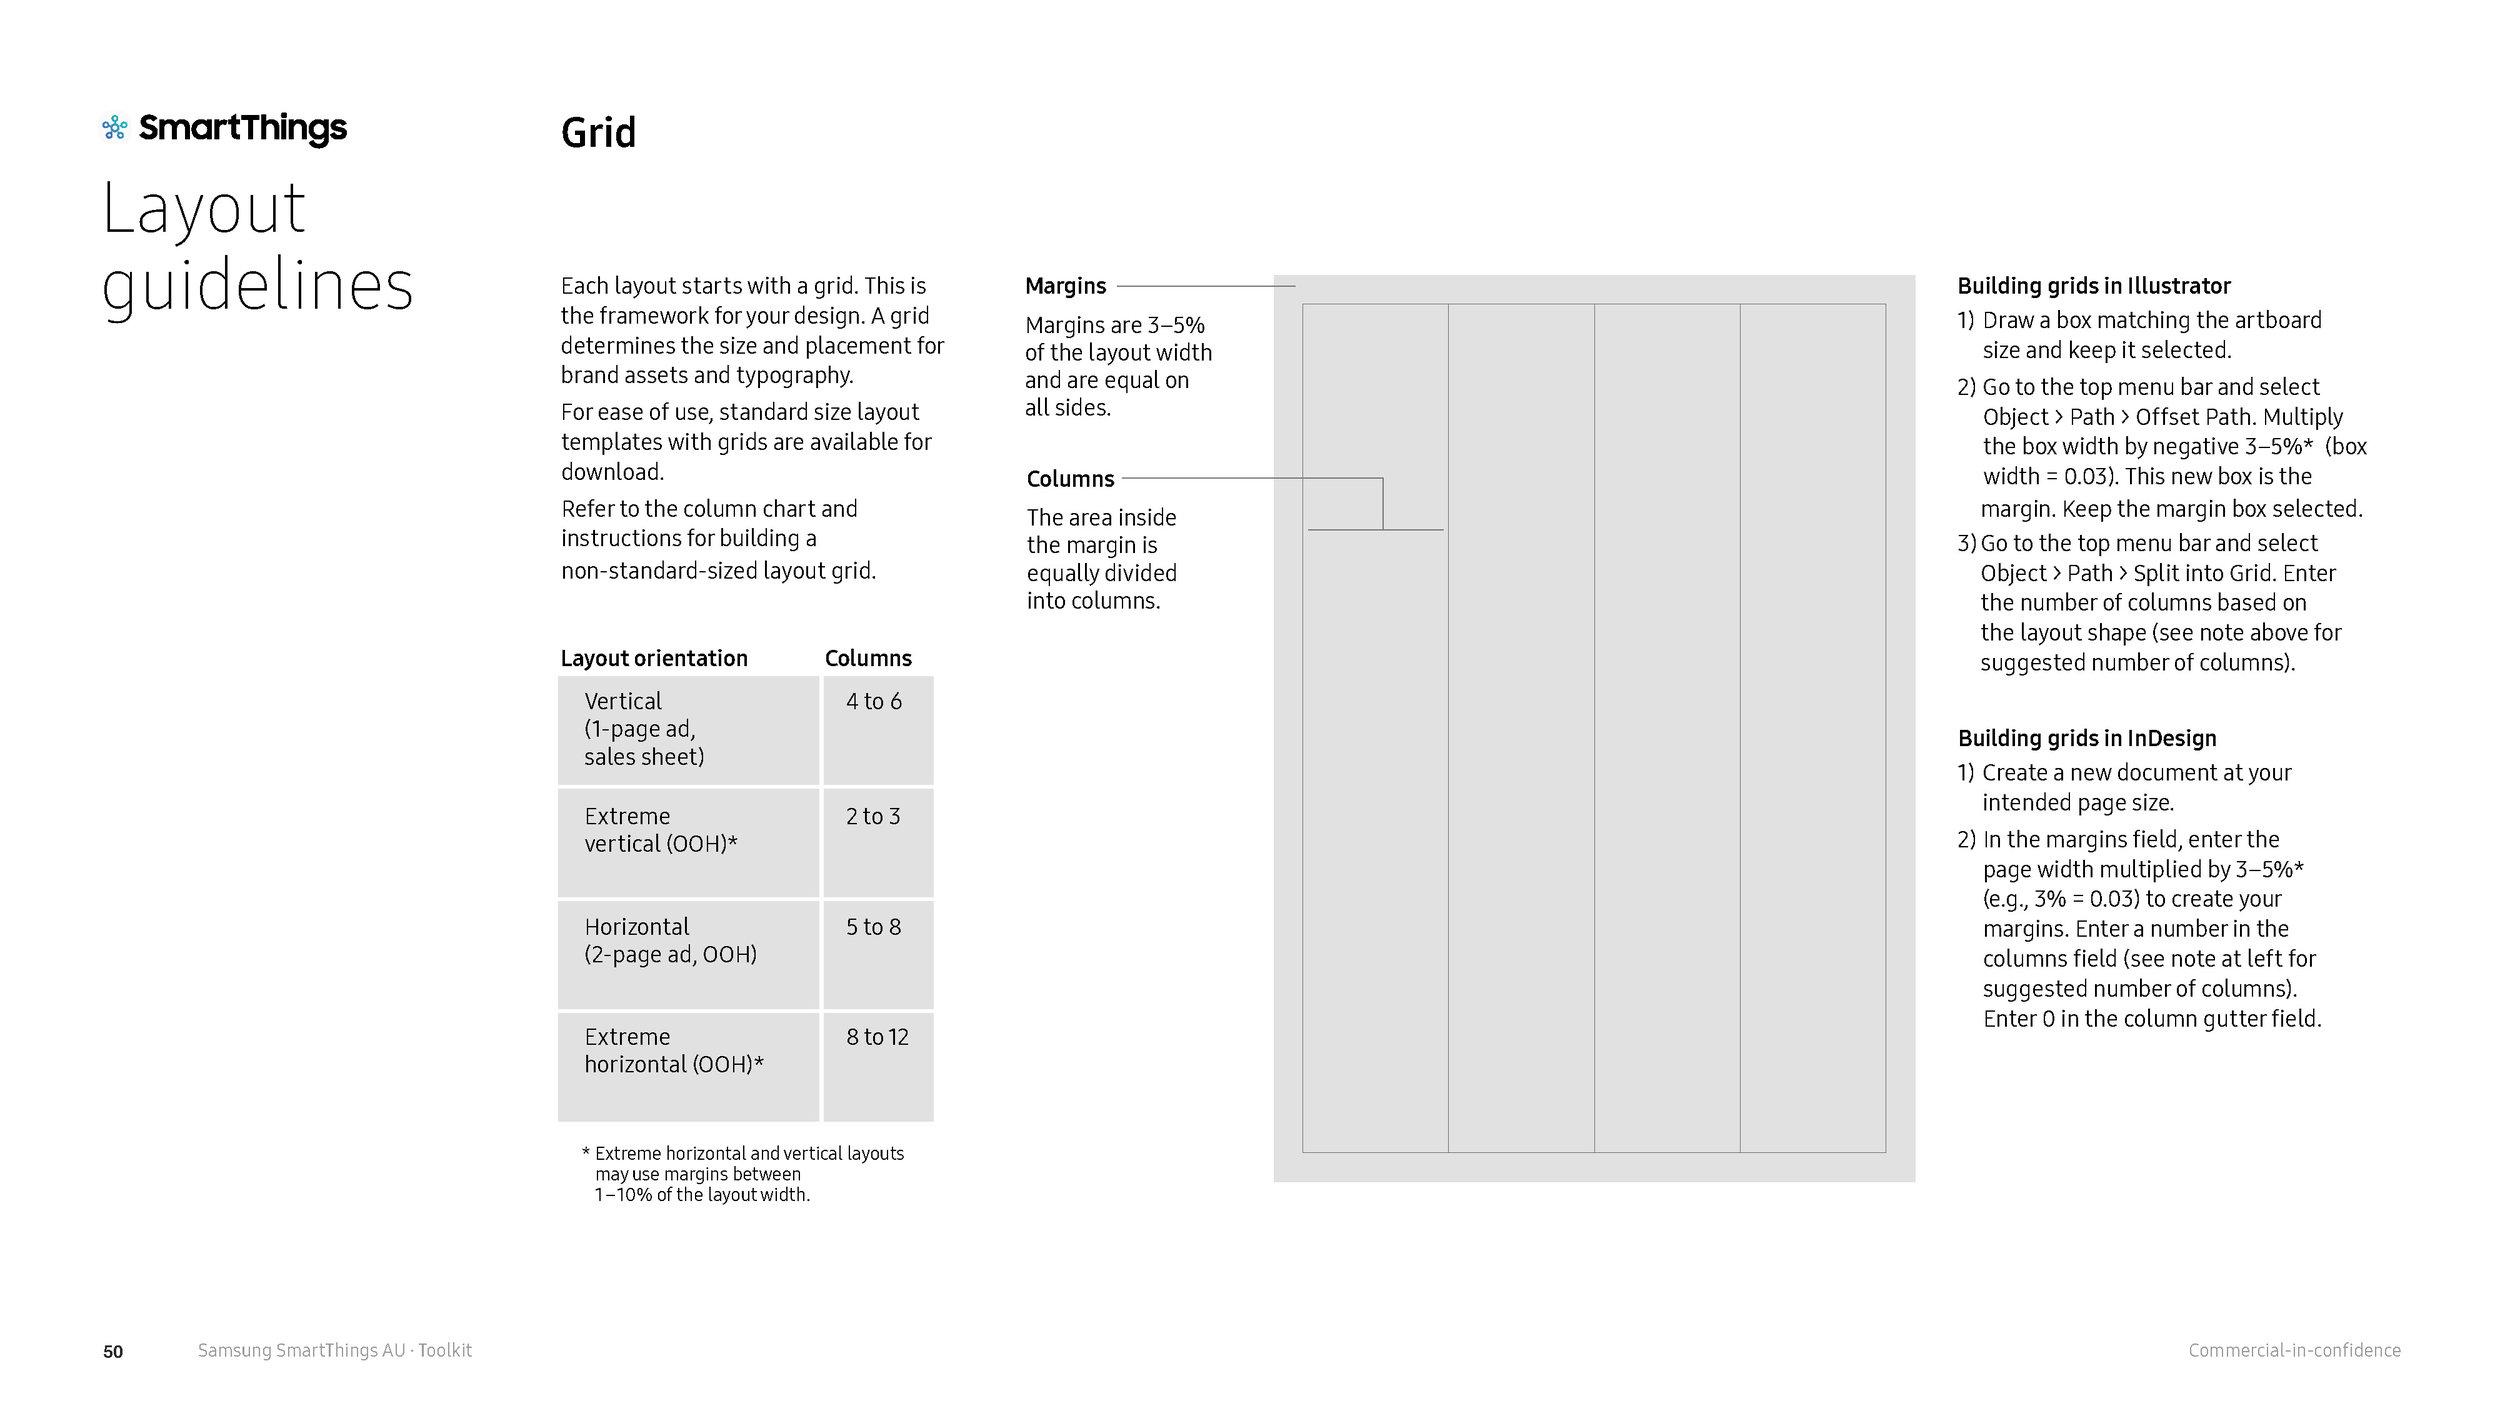 Samsung SmartThings Toolkit 6_Page_50.jpg